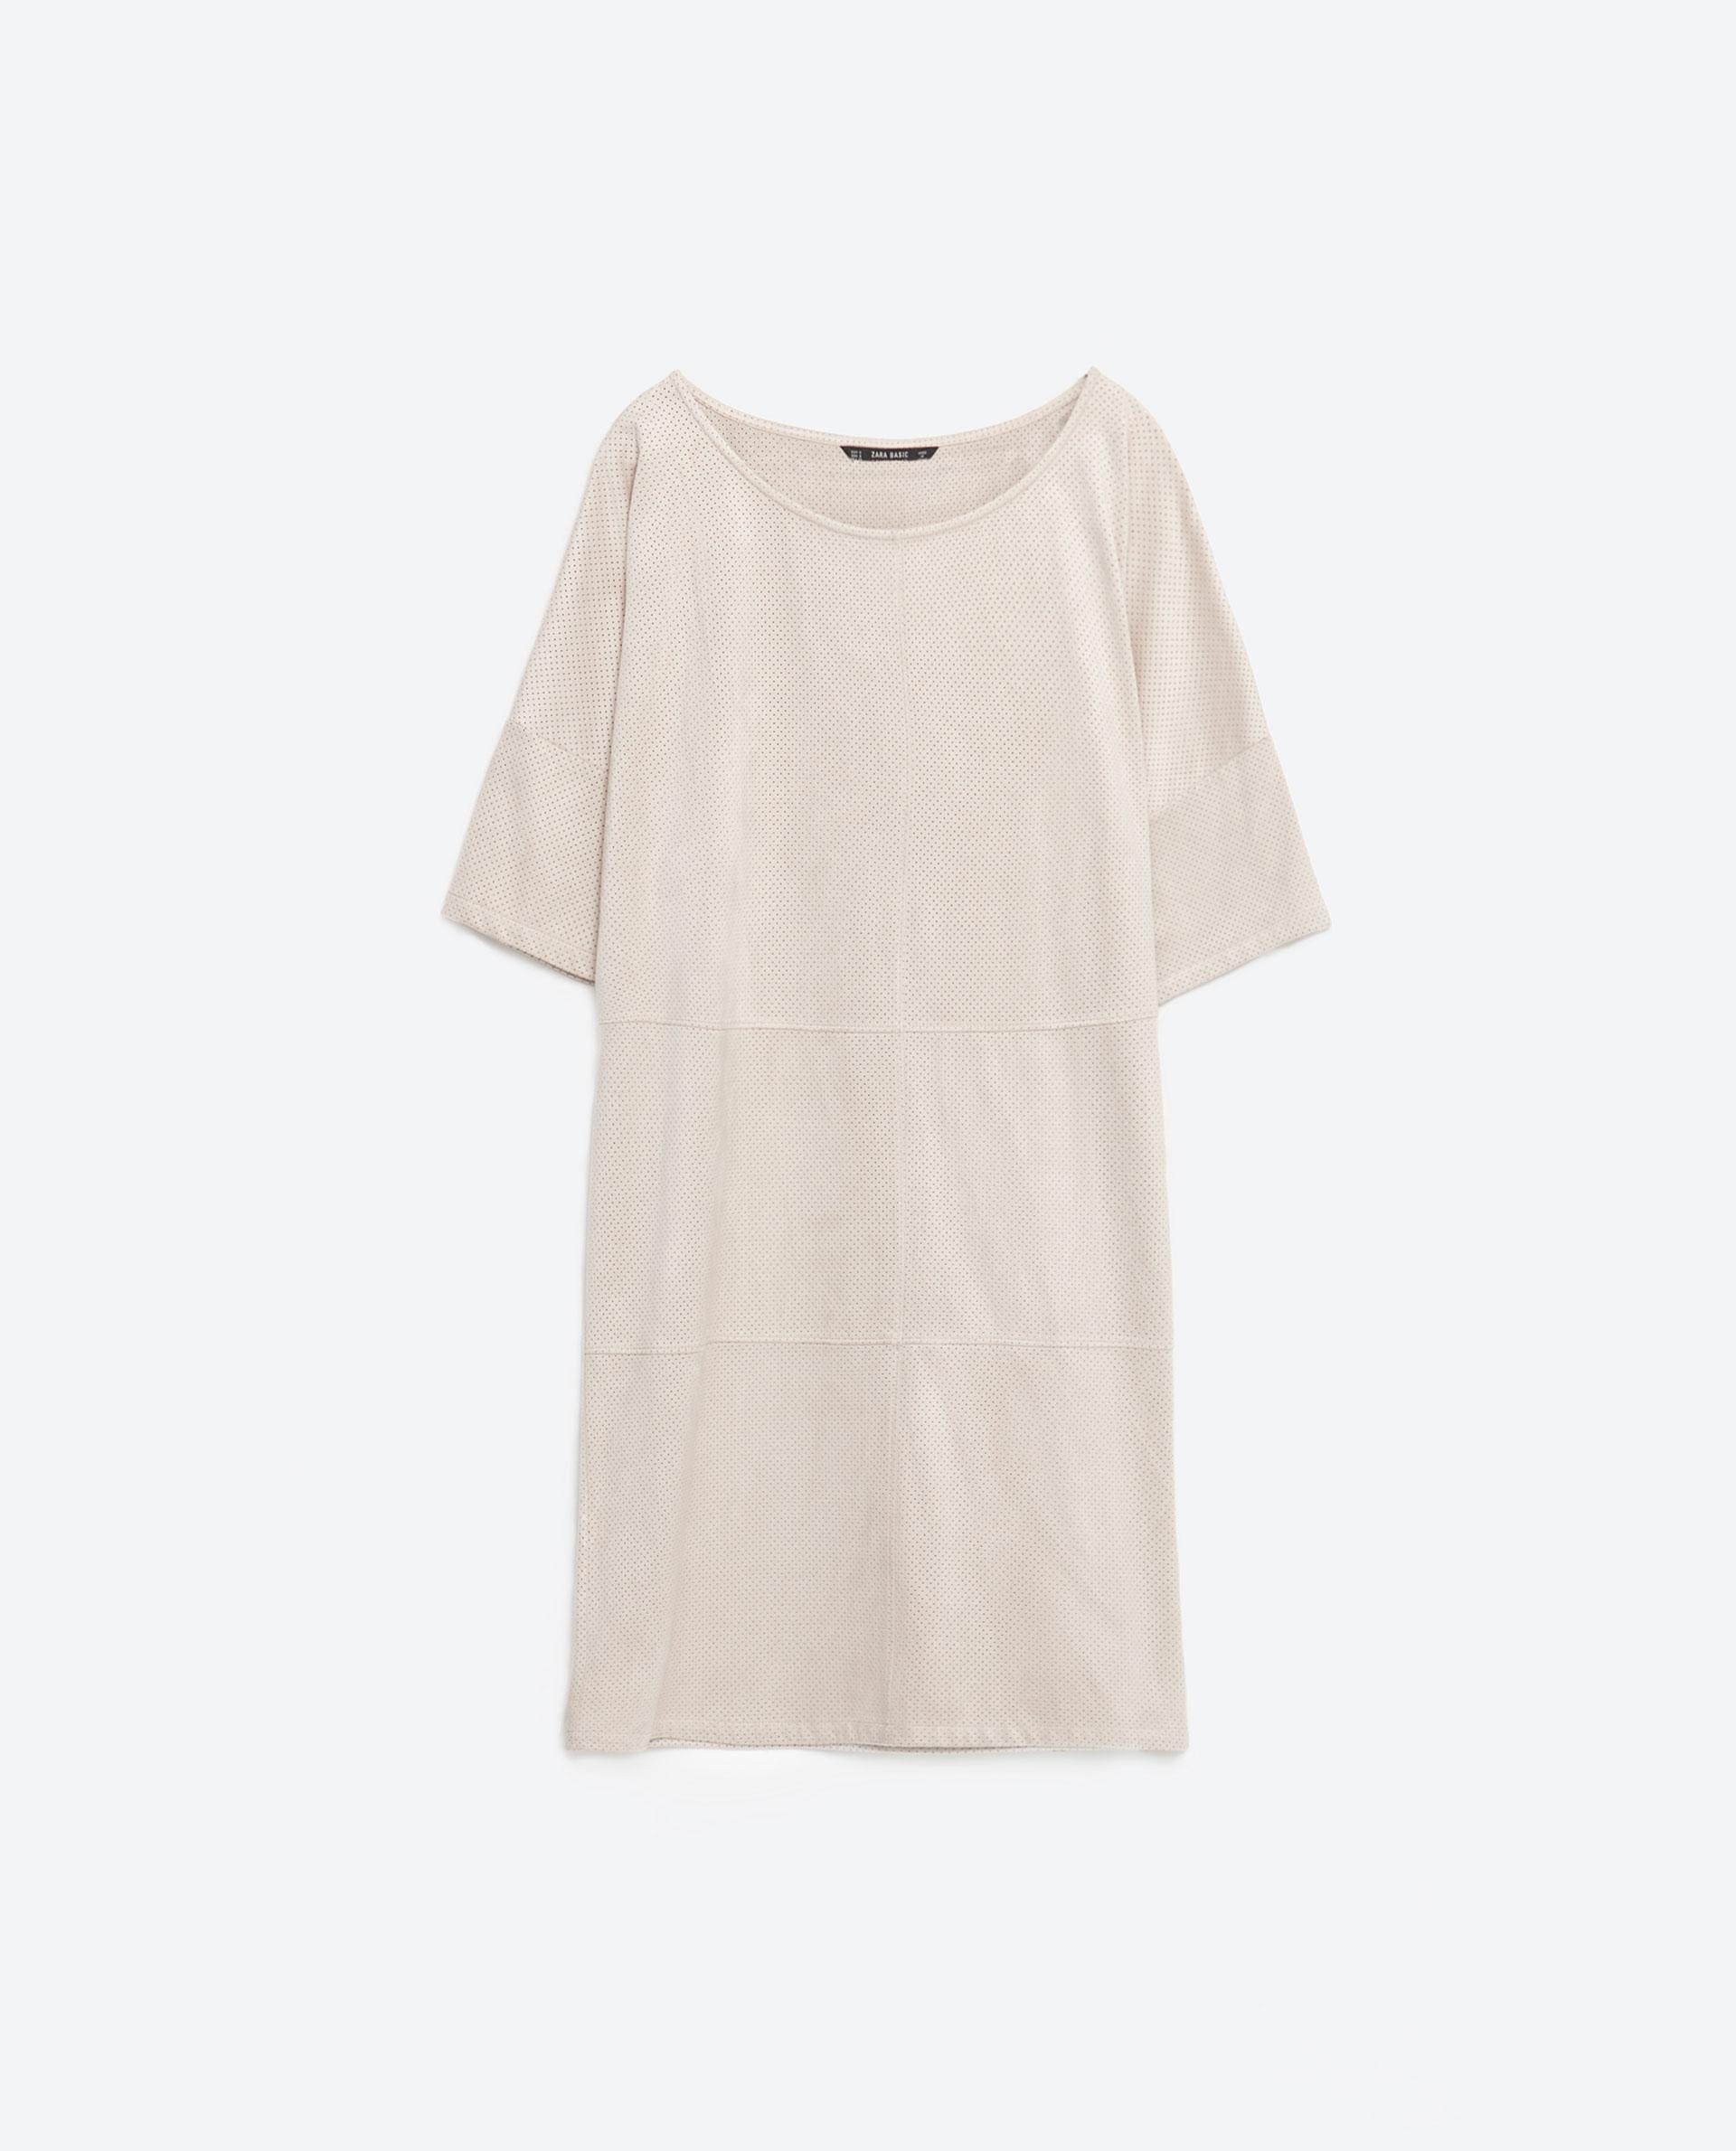 Zara suede effect dress in natural lyst for Zara mens shirts sale